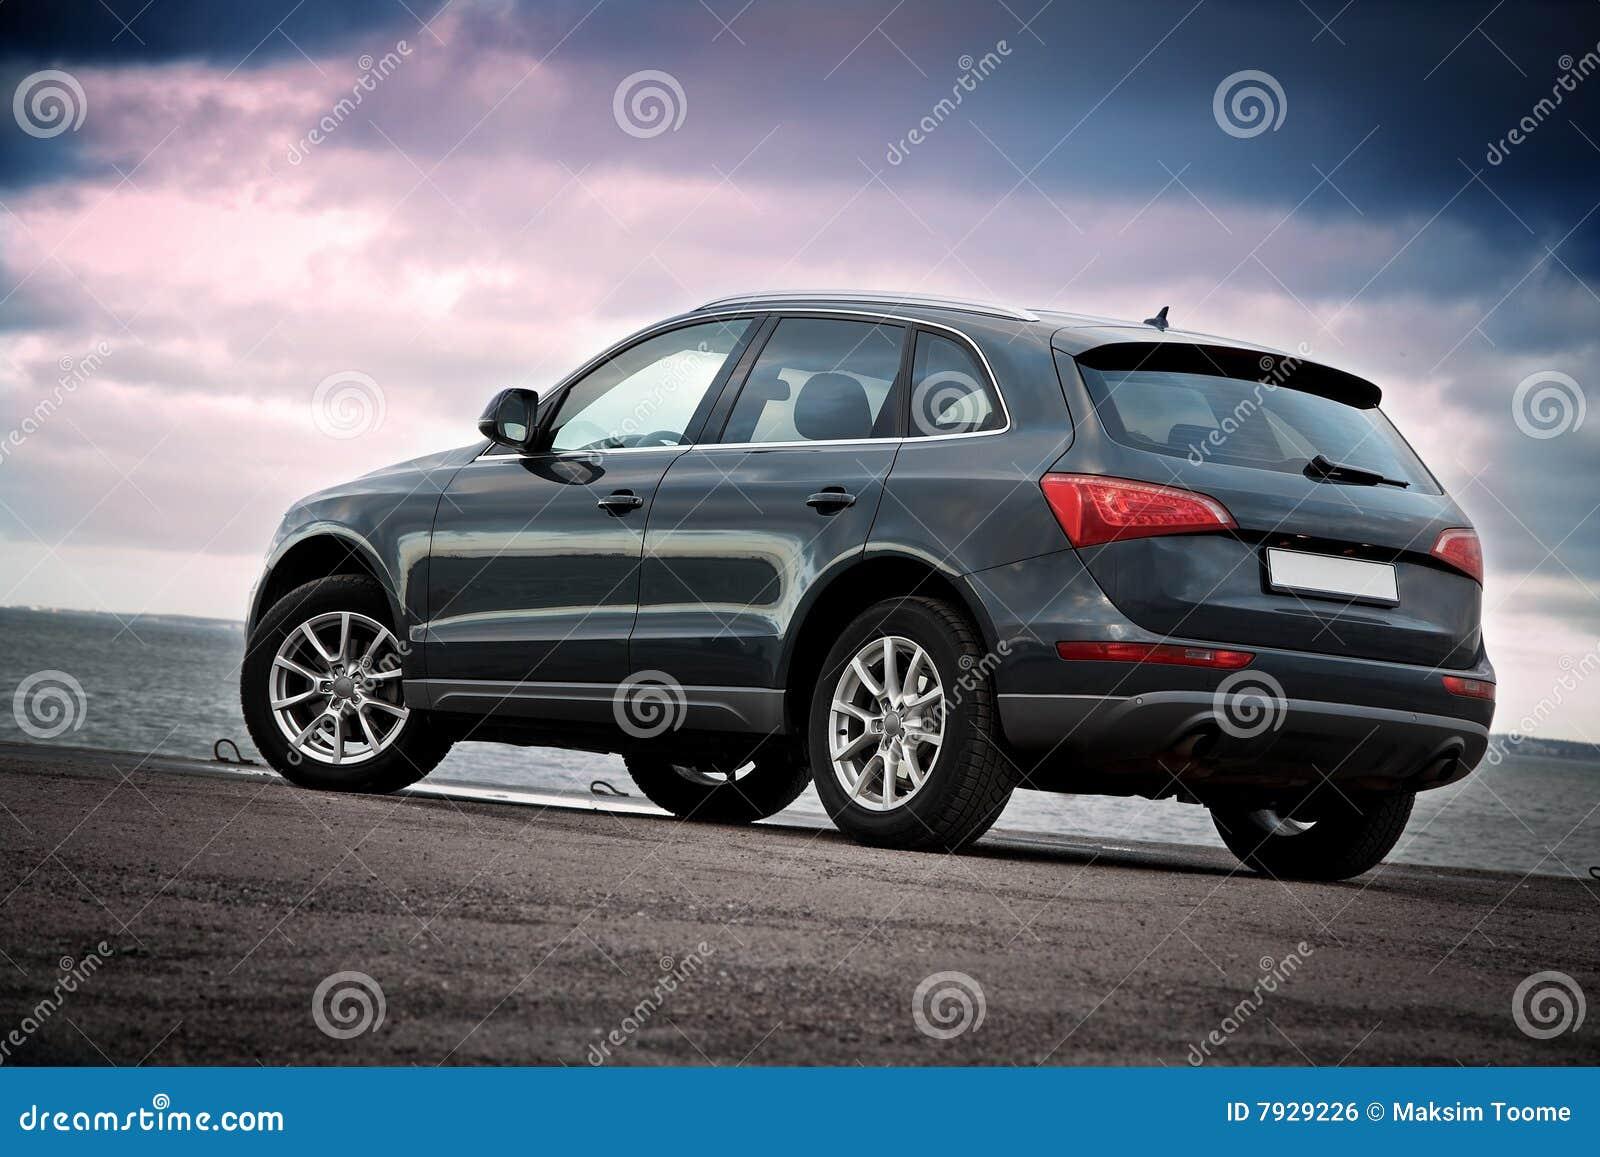 Luxury SUV rear view